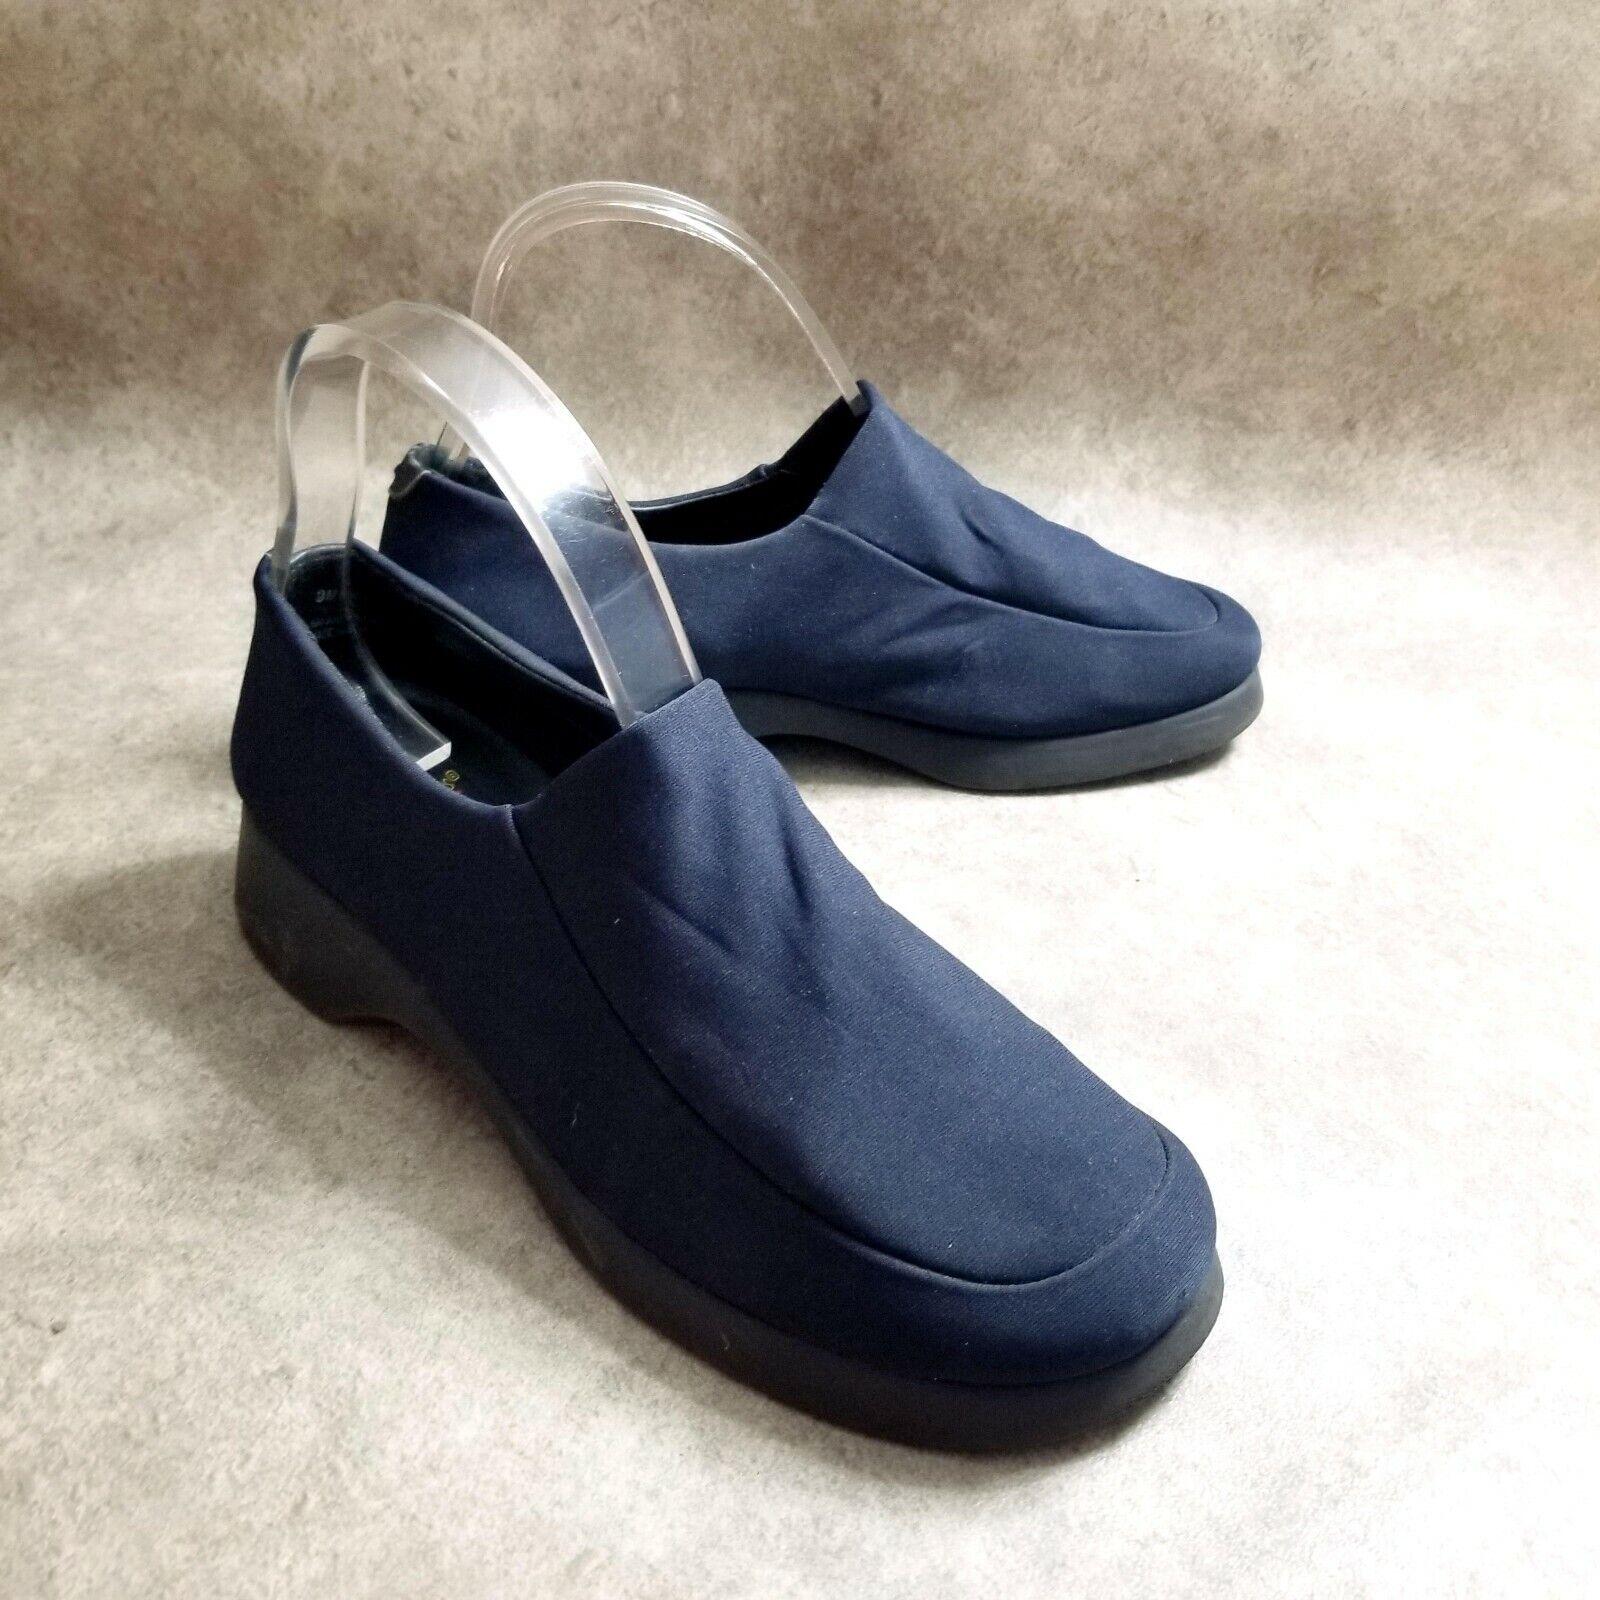 Aerosoles Womens 86586 Size 9 Blue Slip On Loafer Comfort Shoes